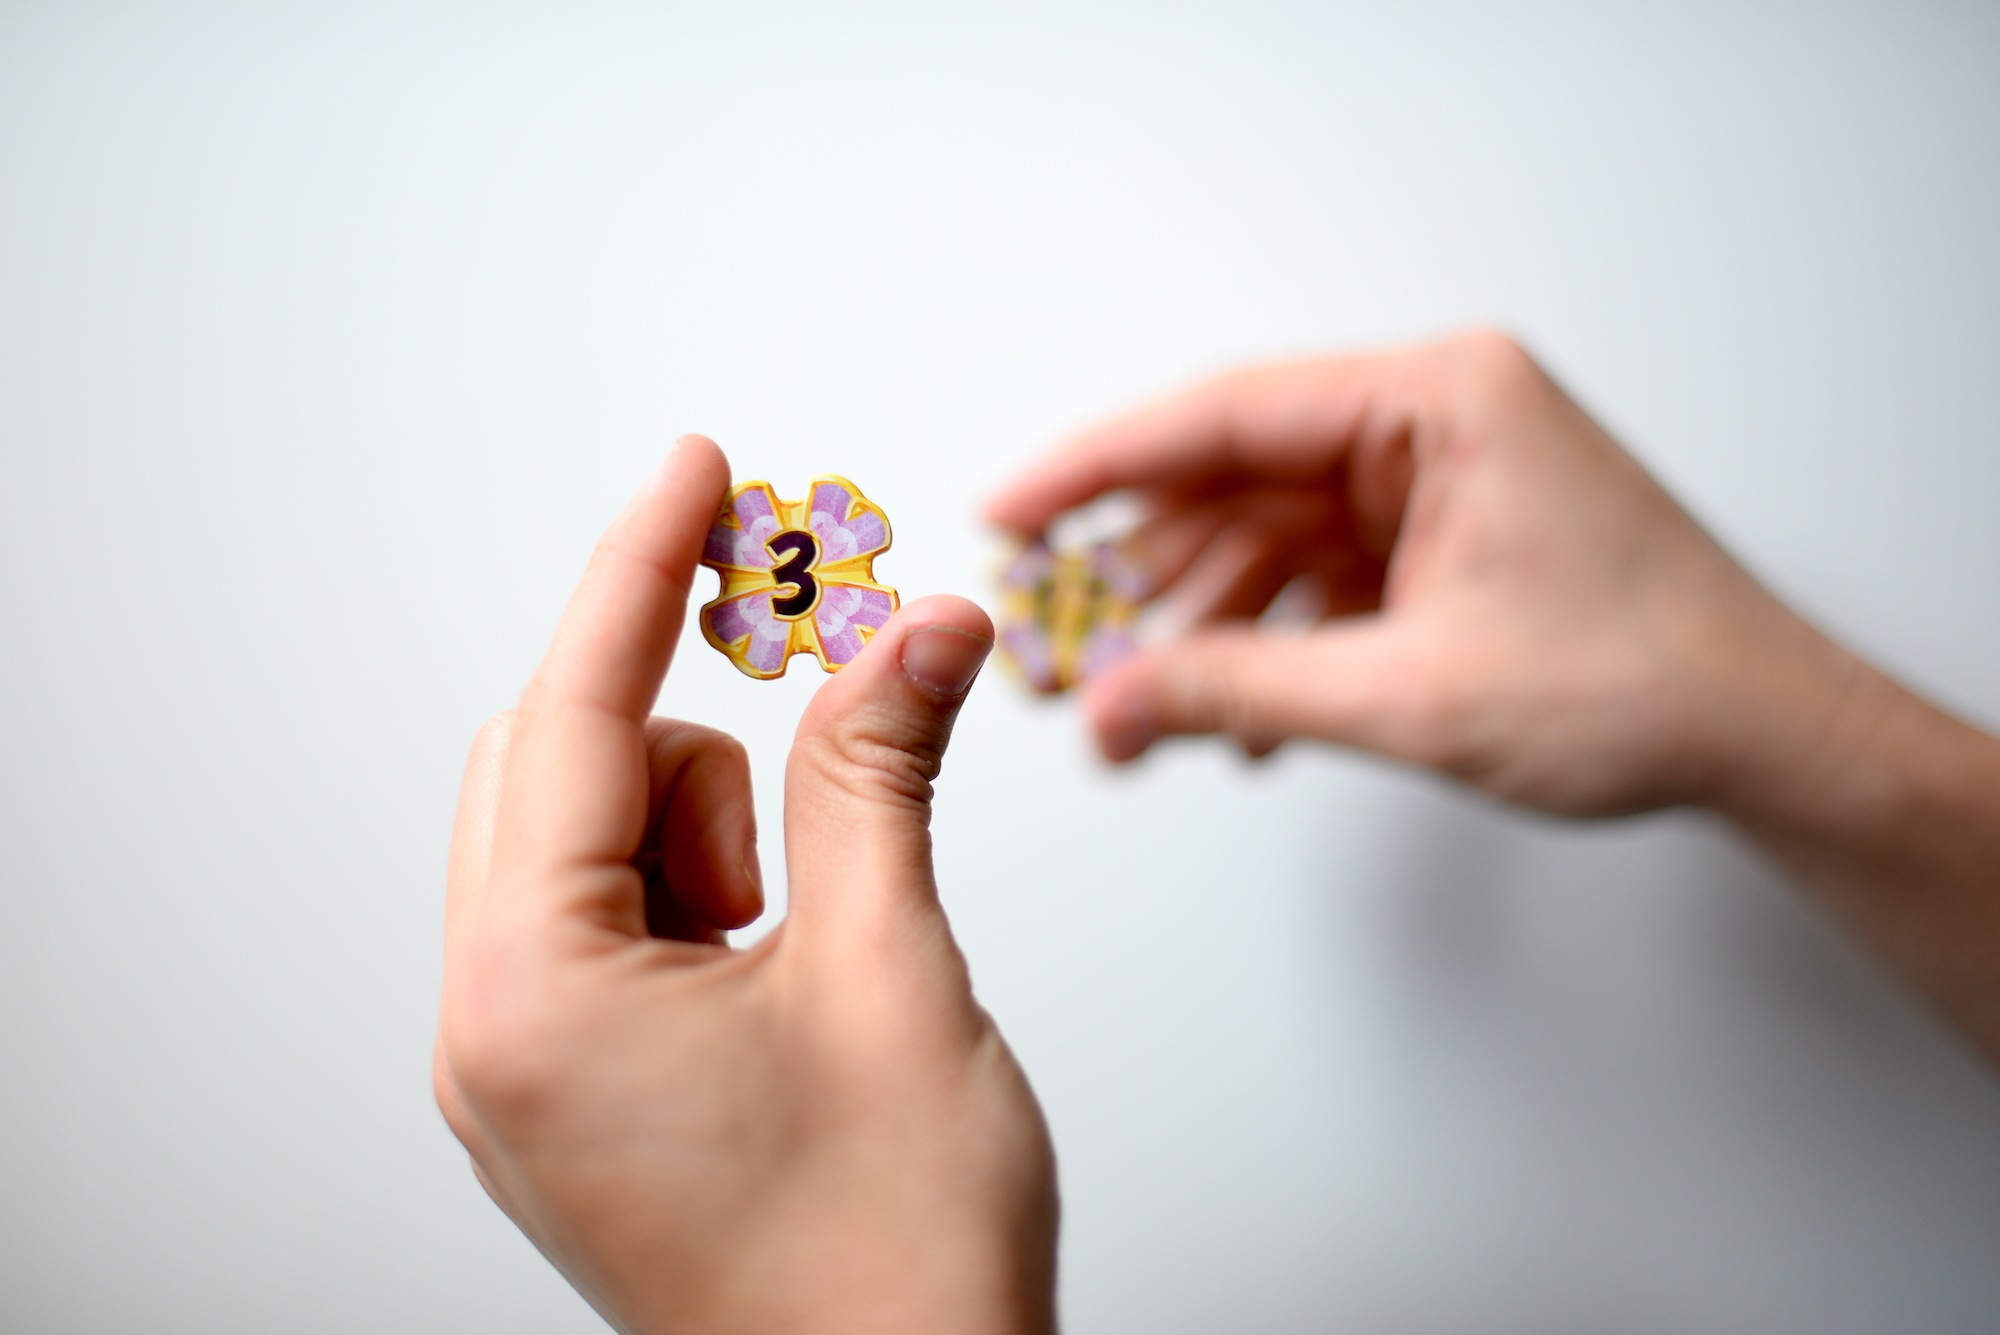 lucky-numbers-jeu-avis-test-3